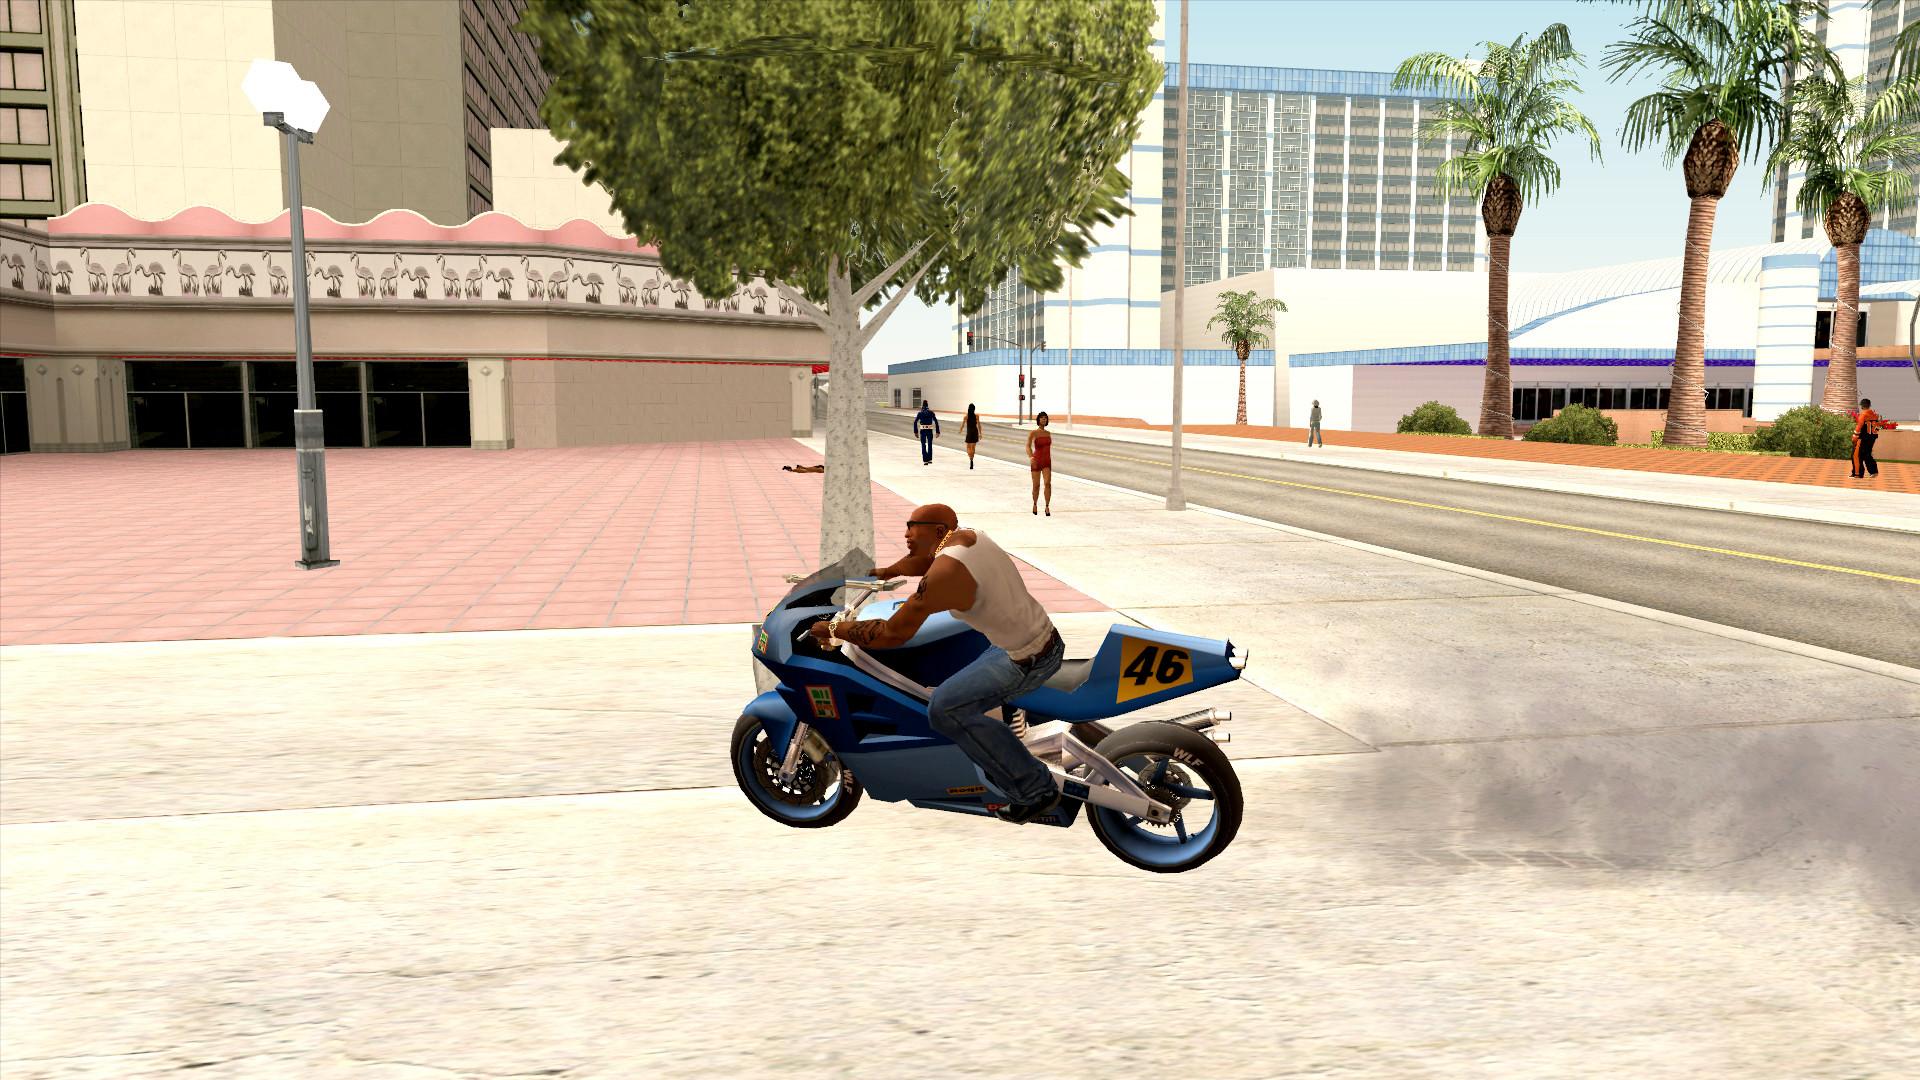 gta_sa 2016-05-17 14-03-54-69.jpg - Grand Theft Auto: San Andreas